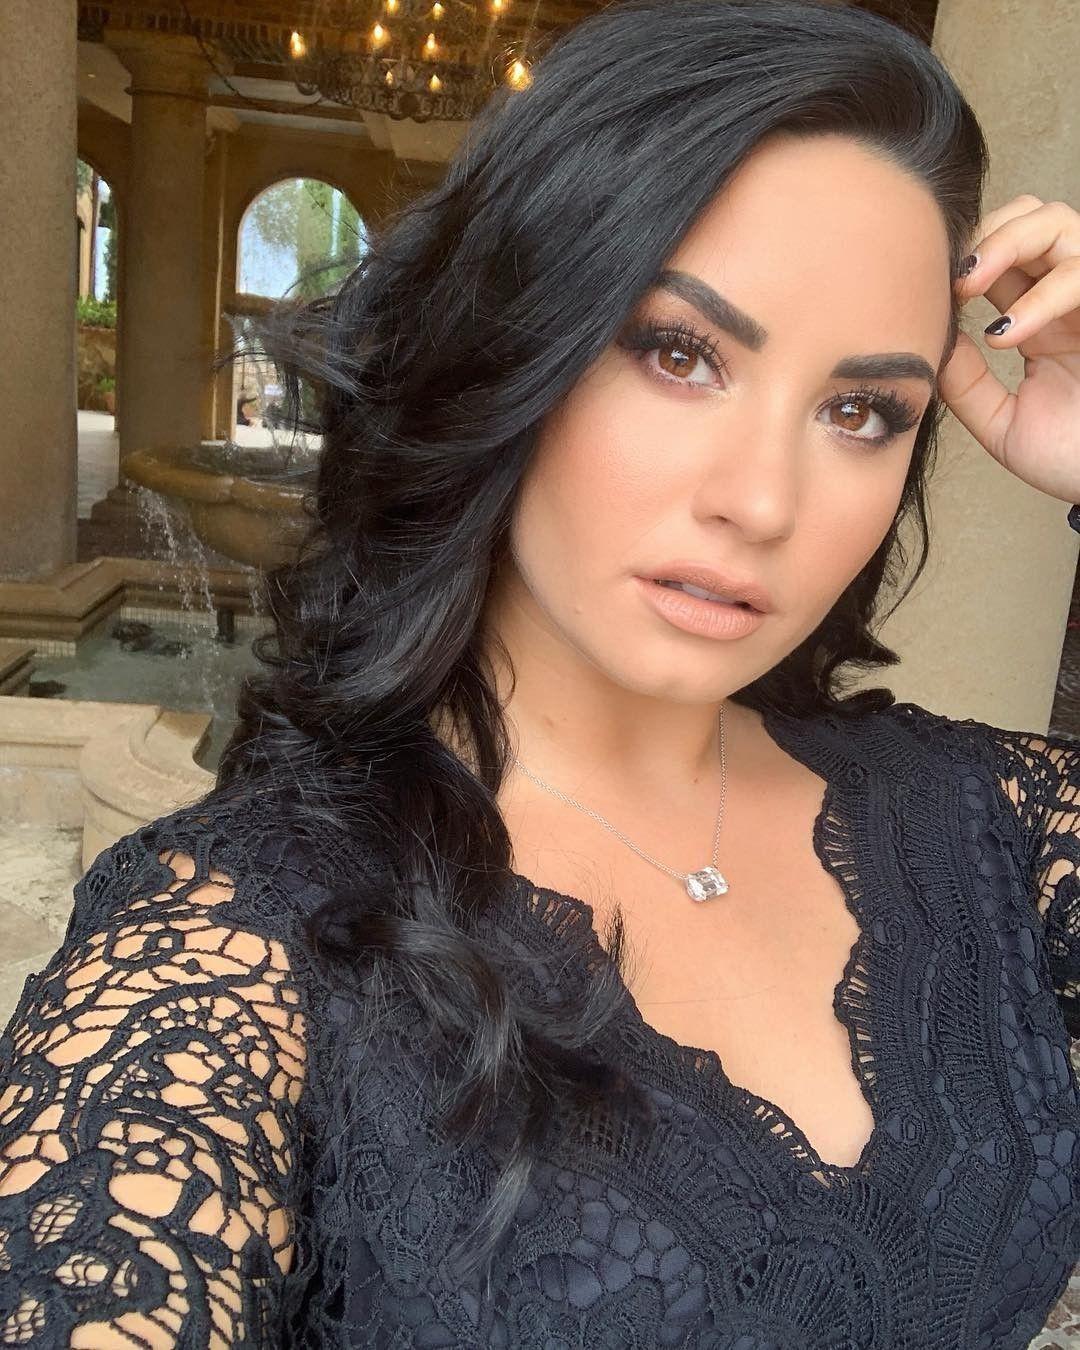 15+ Grammys 2019 Demi Lovato 2019